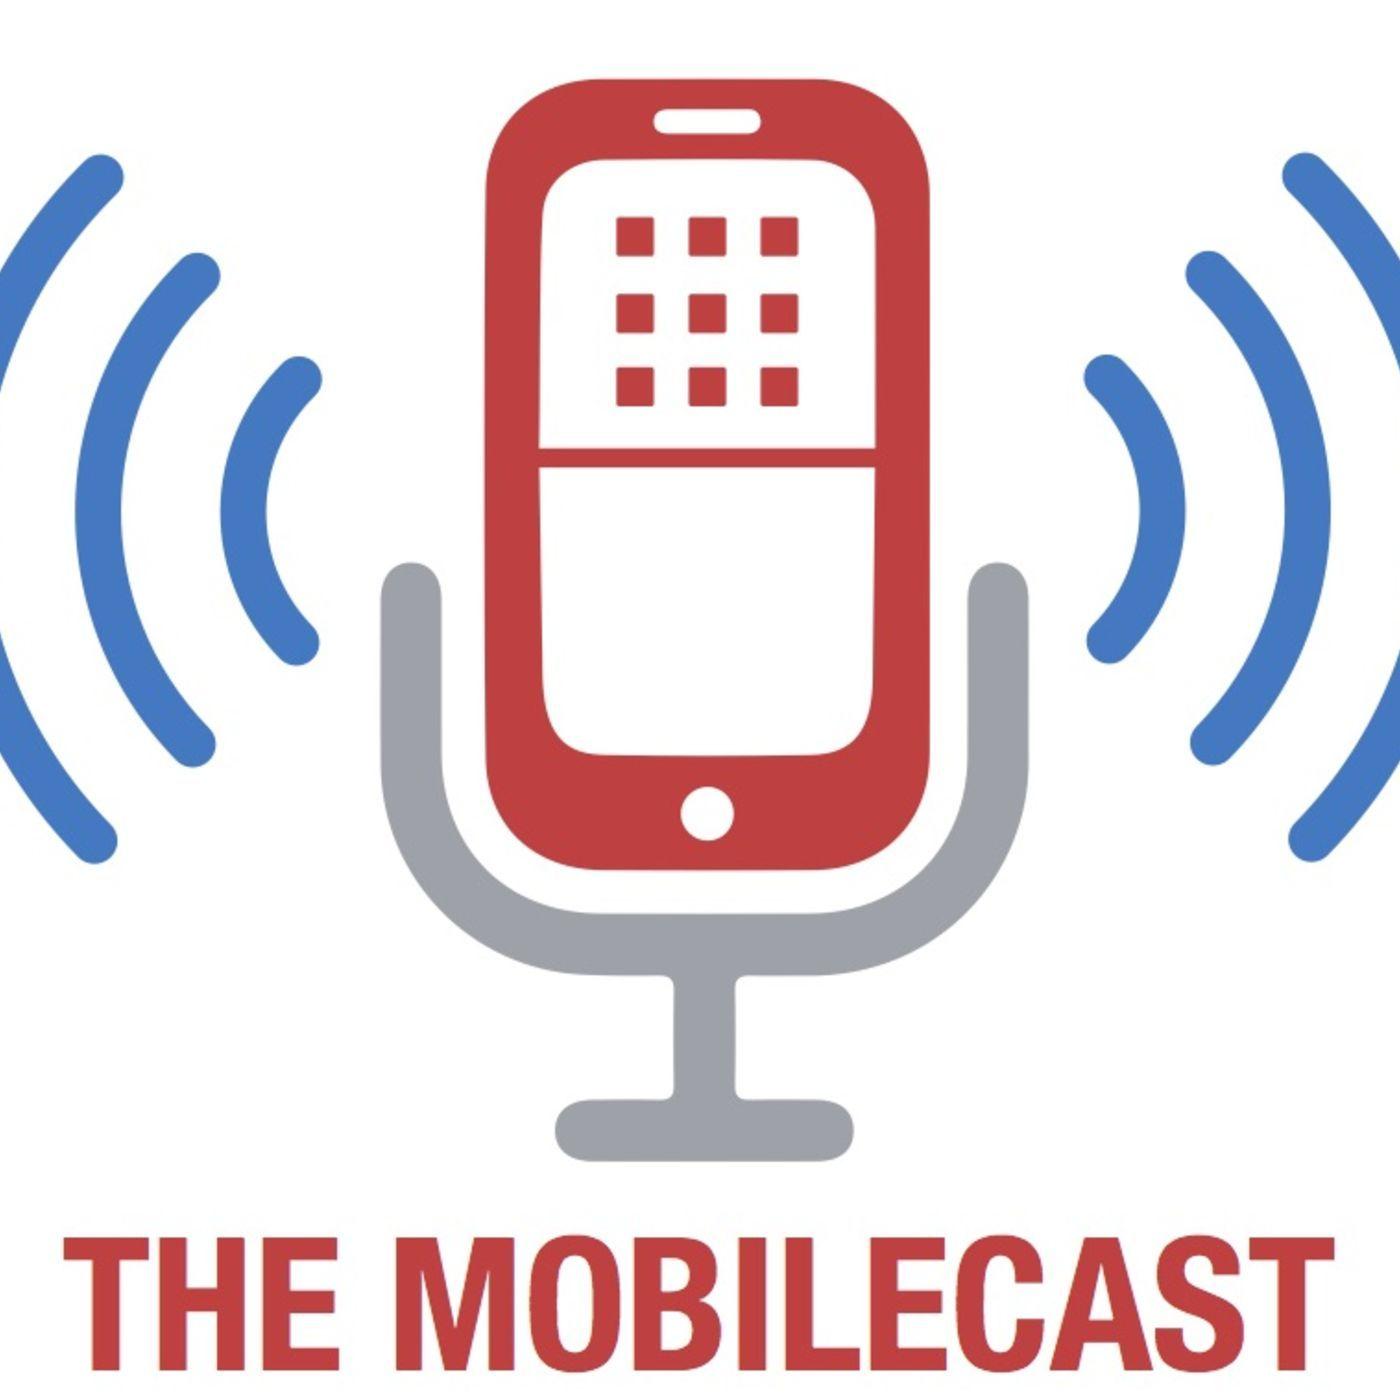 The Mobilecast #306 – S3 Ep 06 MWC 2016 Day 4 Recap with Nirave Gondhia